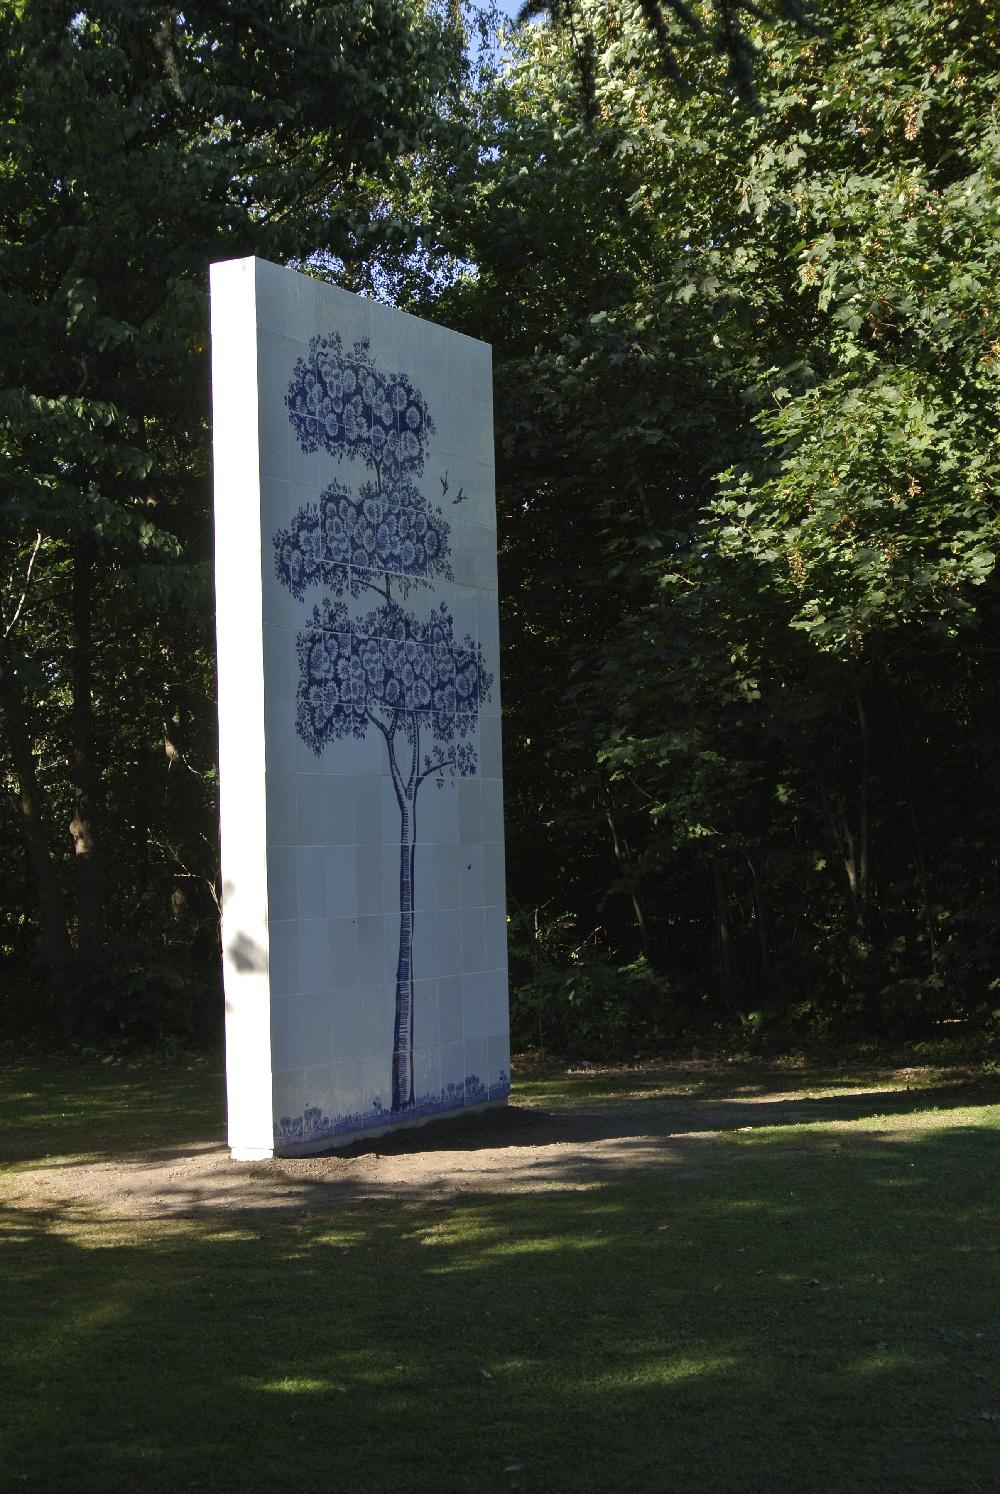 The Guldagergård Tree (after Spode) 8